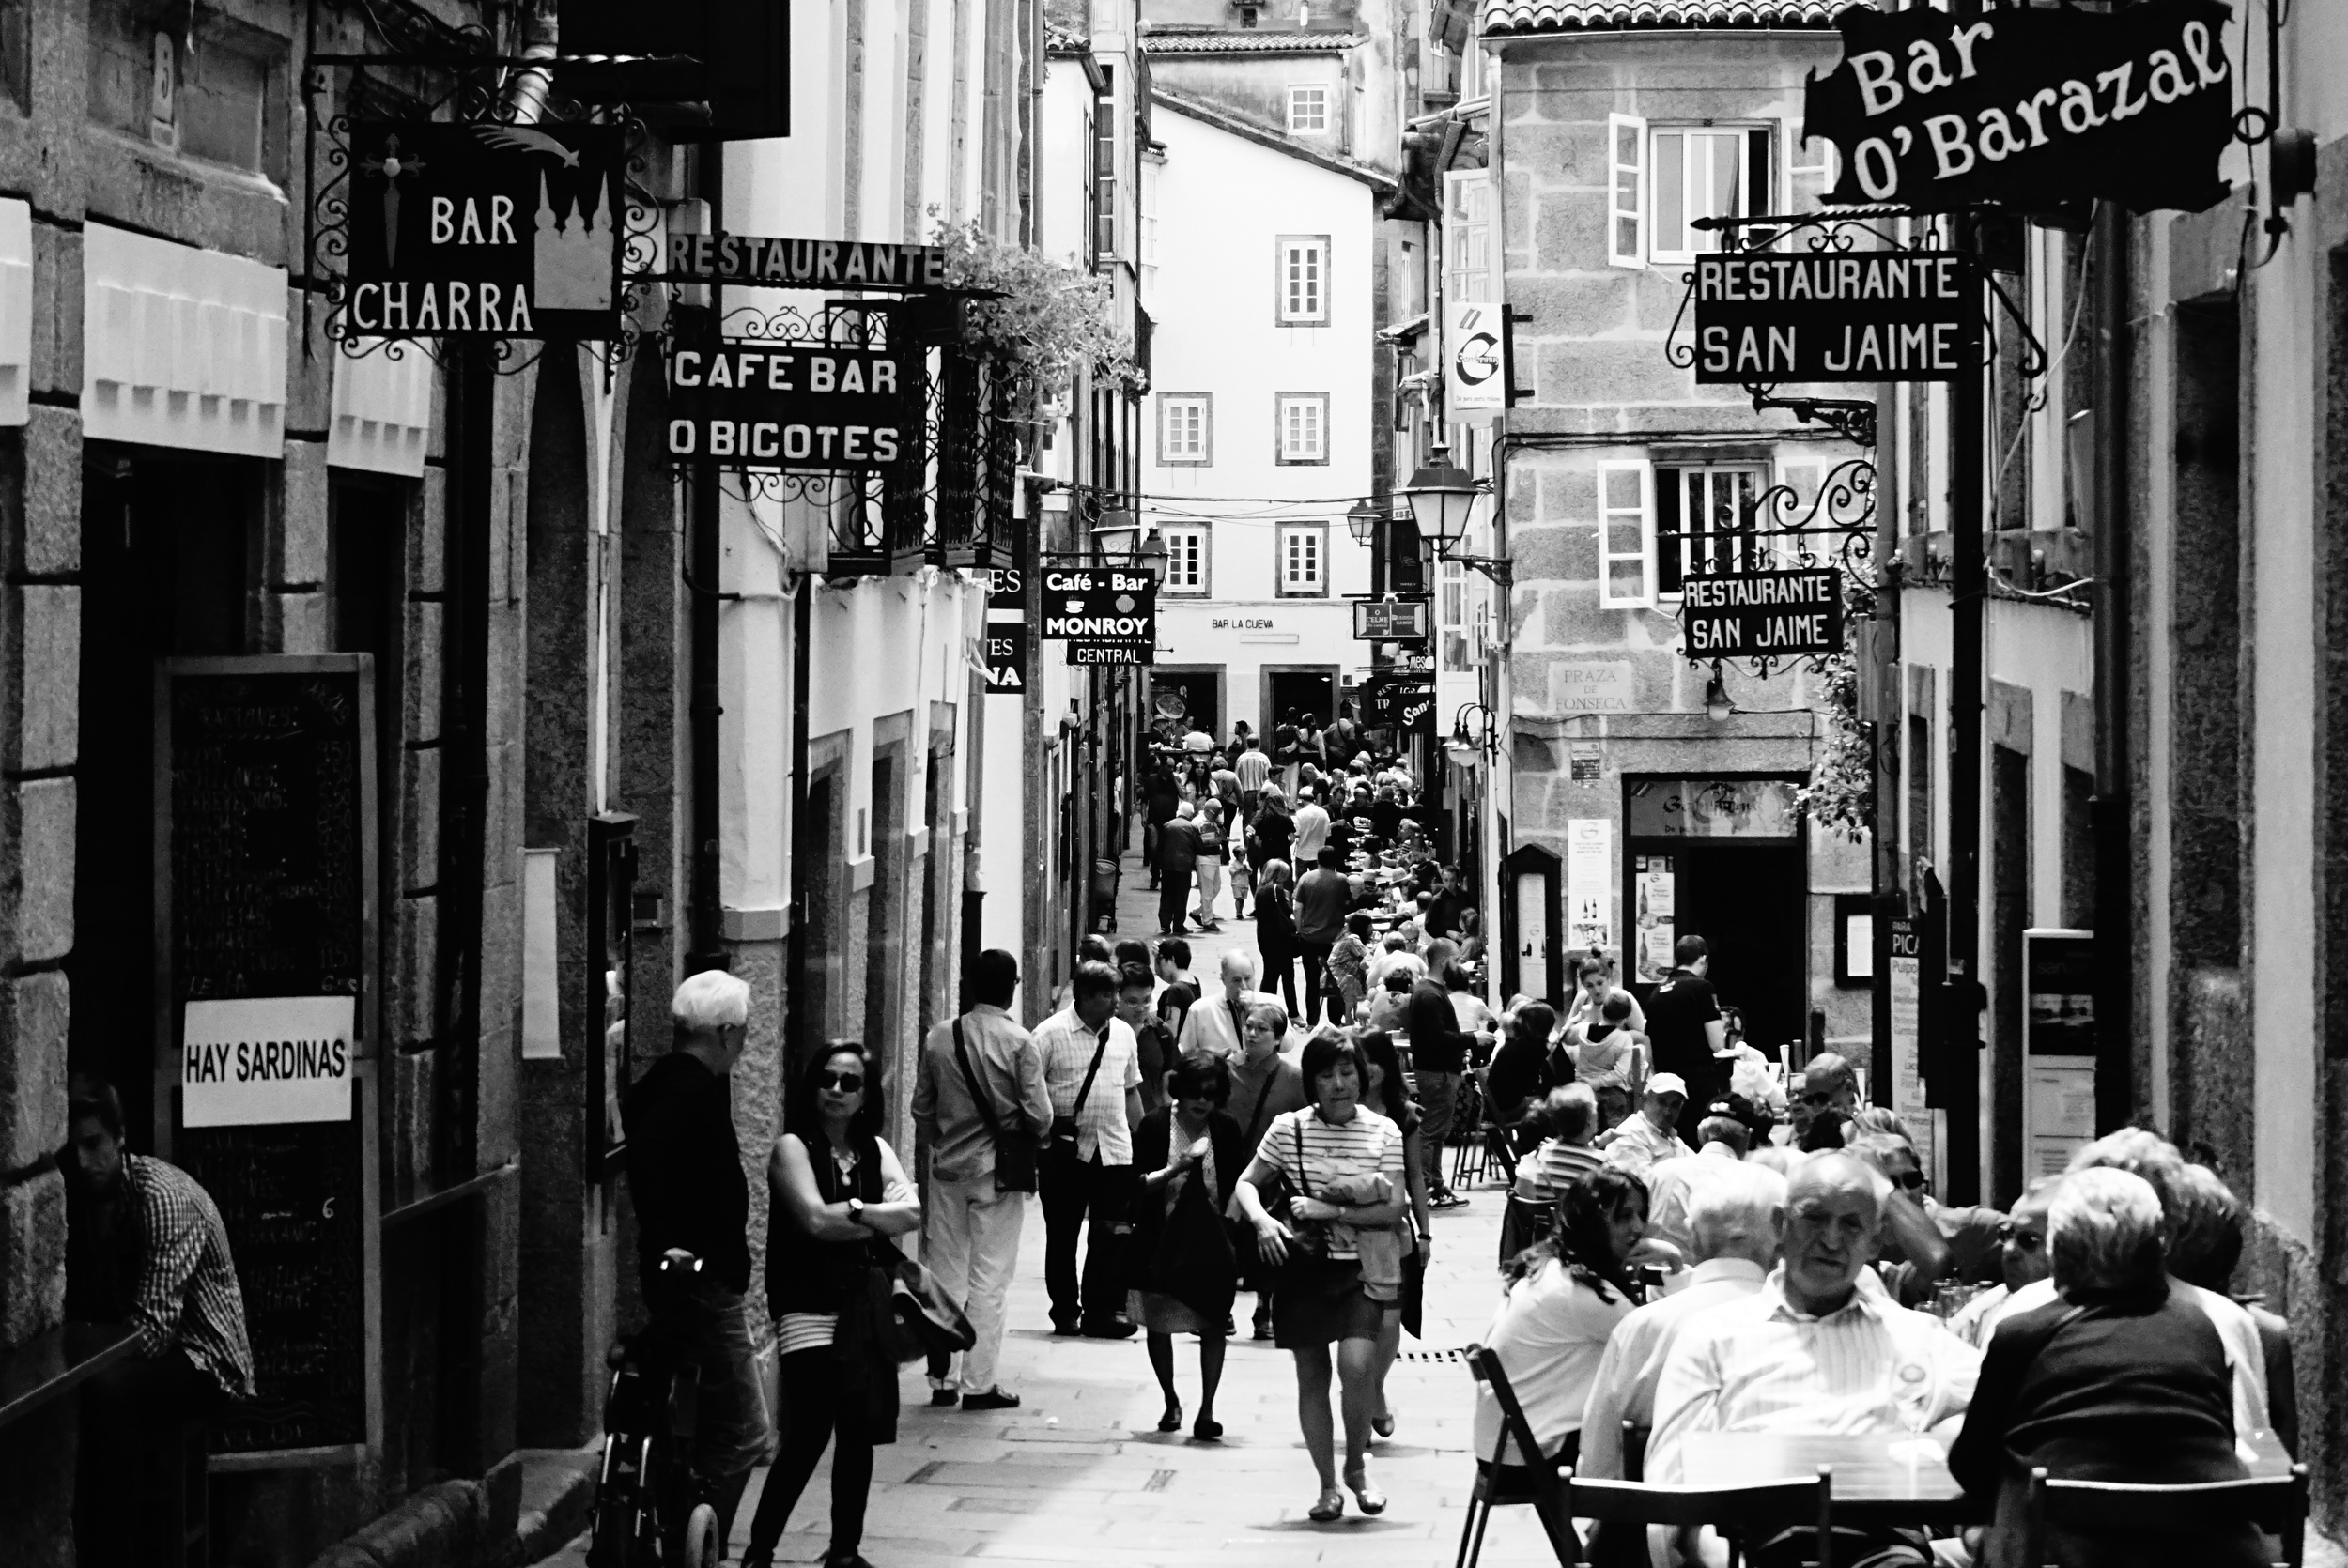 Santiago de Compostela, Spain (2015)